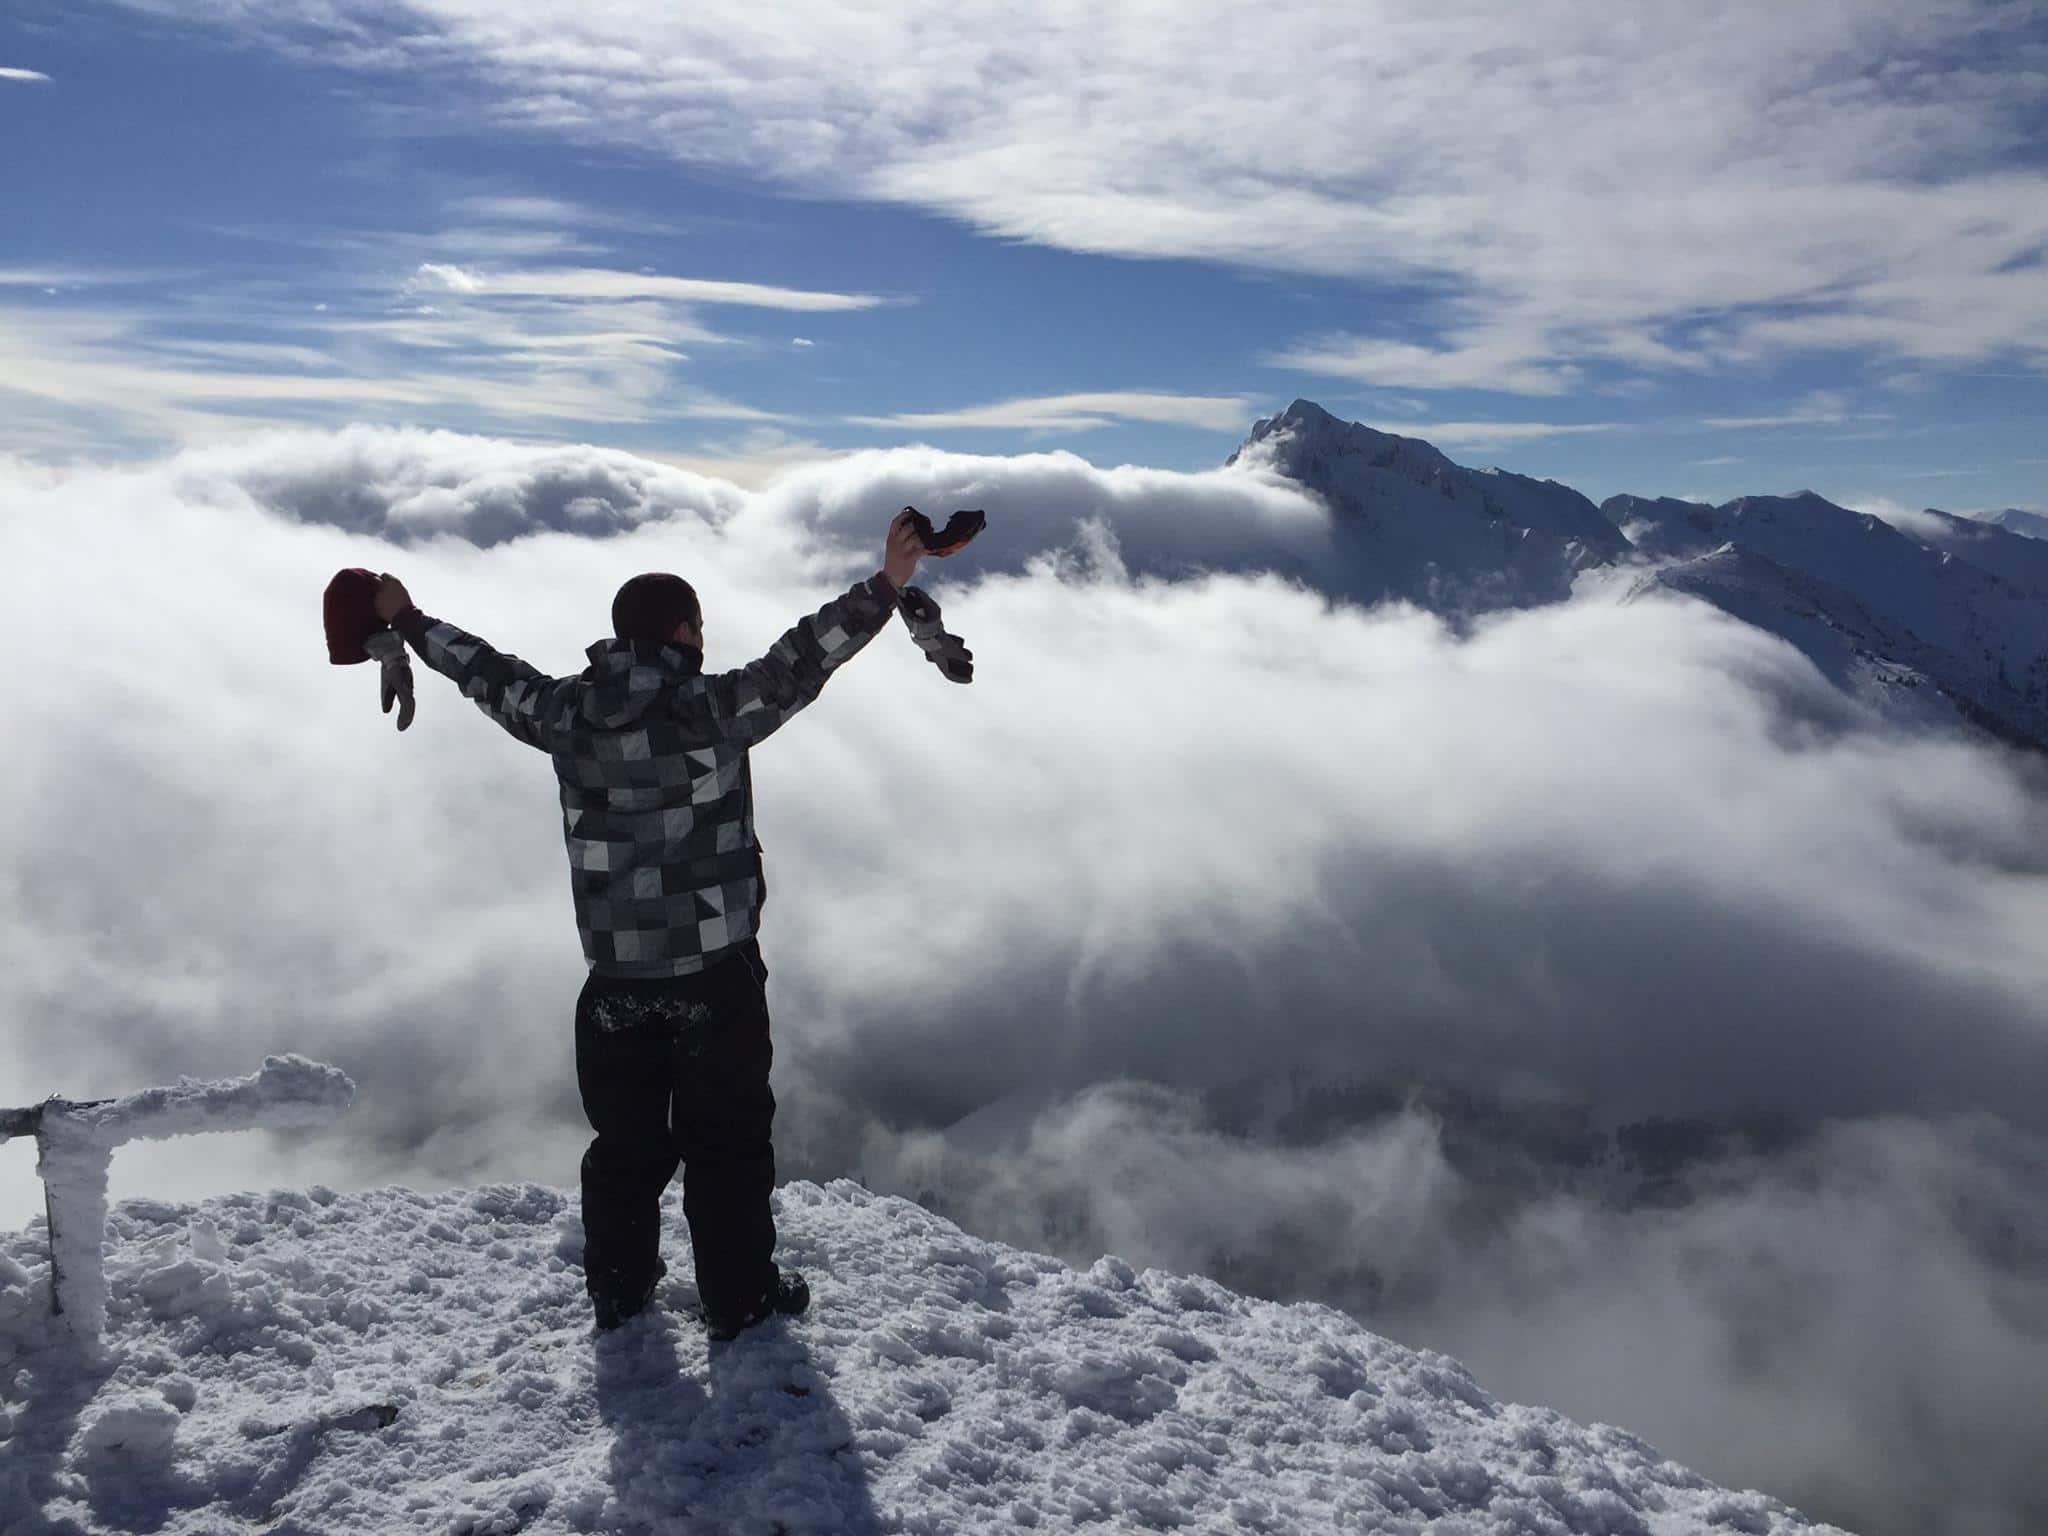 Alpesi-szállás-kalandok-prabichl-sieles-snowboard-www.alpesikaland.hu-4